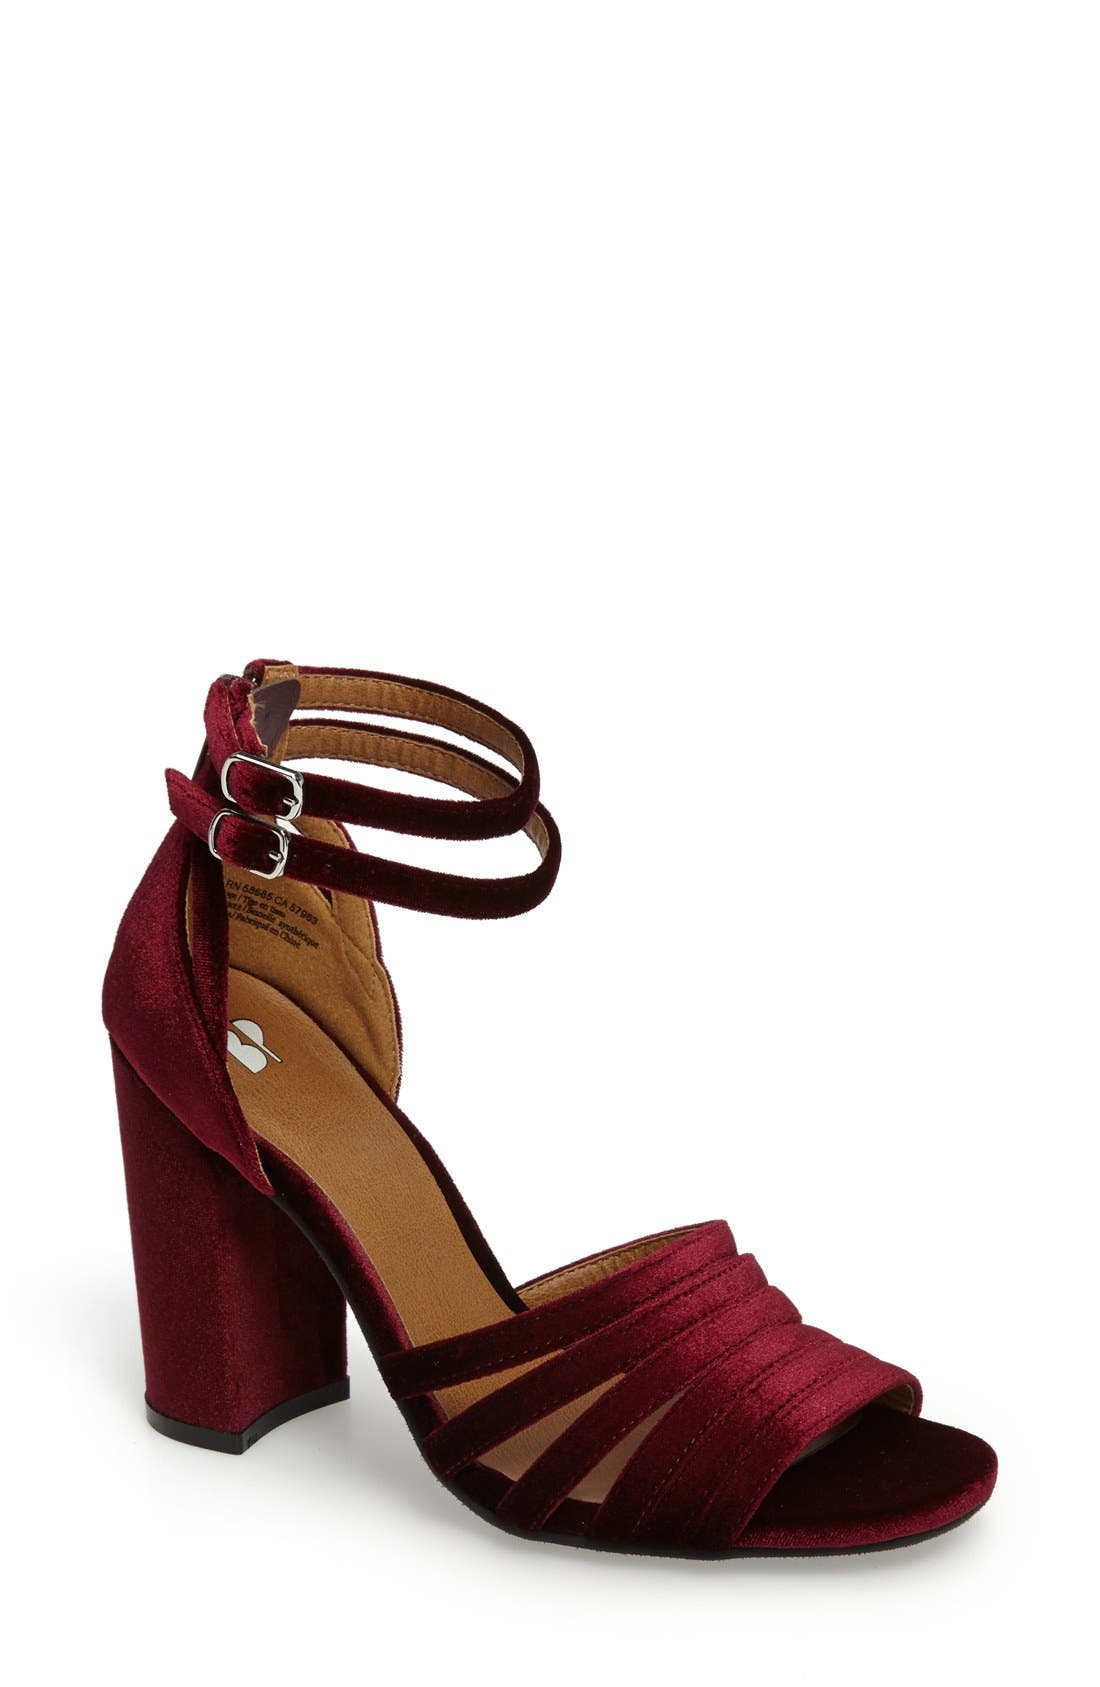 Main Image - BP. Gaby Ankle Strap Sandal (Women)